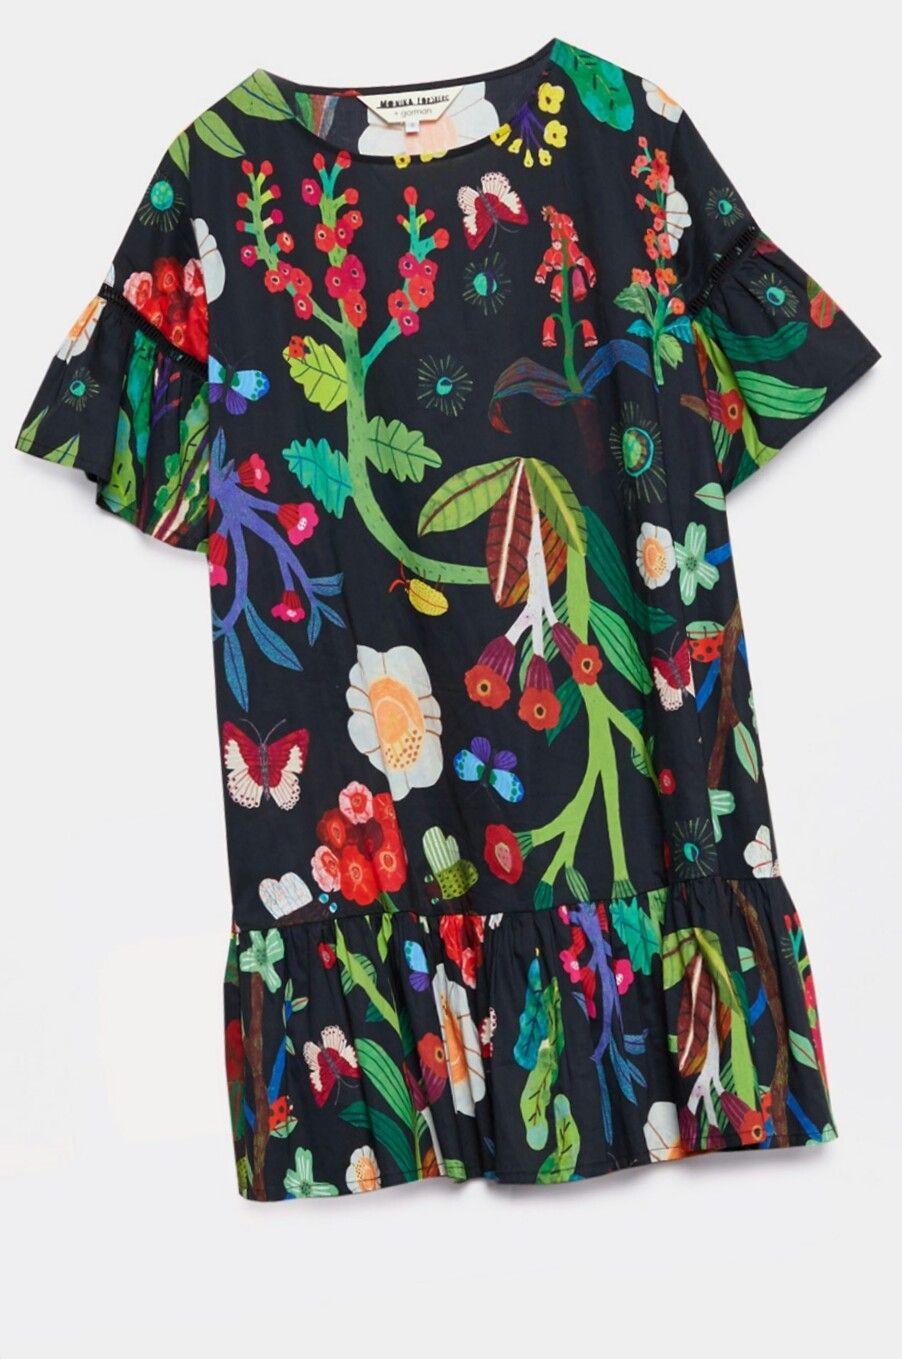 d216ab6fdf Monika Forsberg x Gorman Garden Ruffle dress | terzicilik in 2019 ...